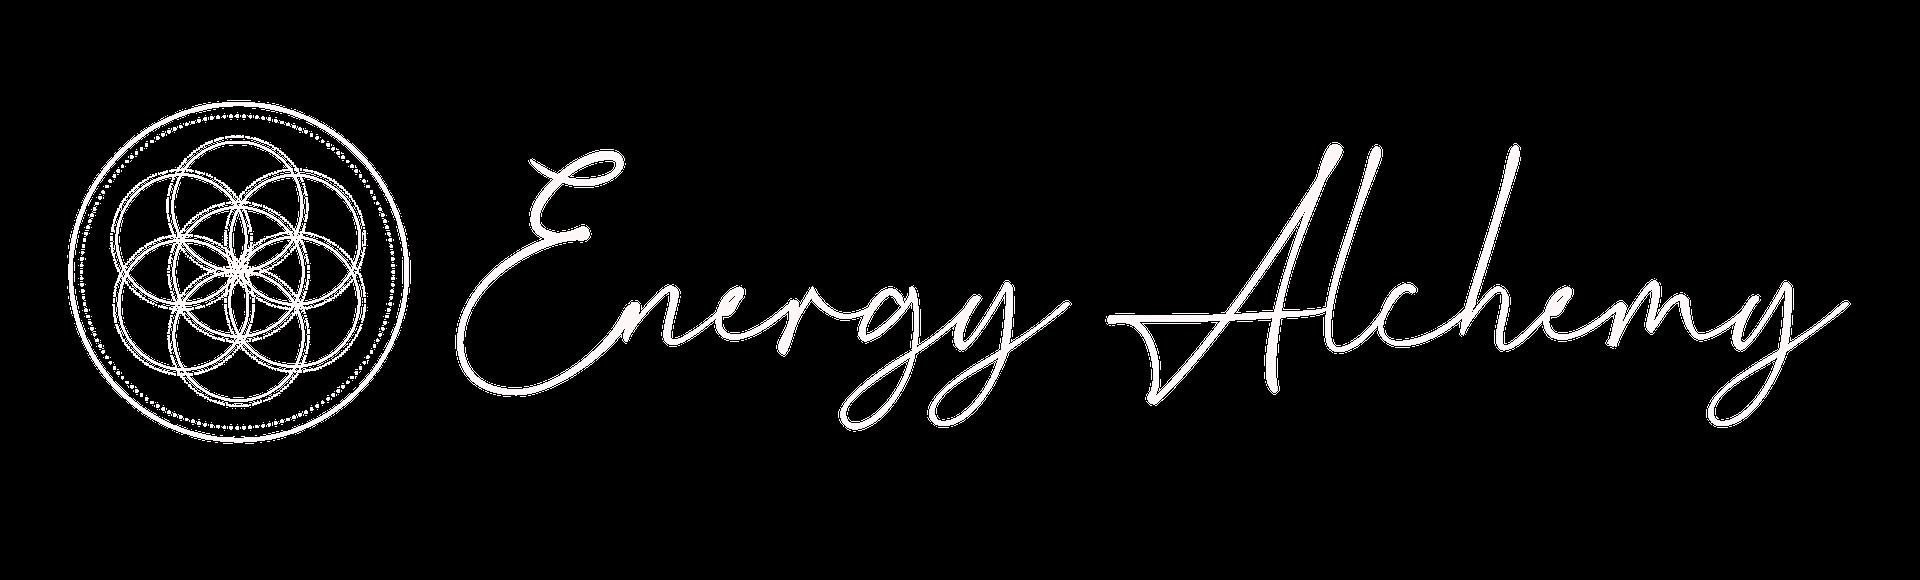 Energy Alchemy w Logo L.png